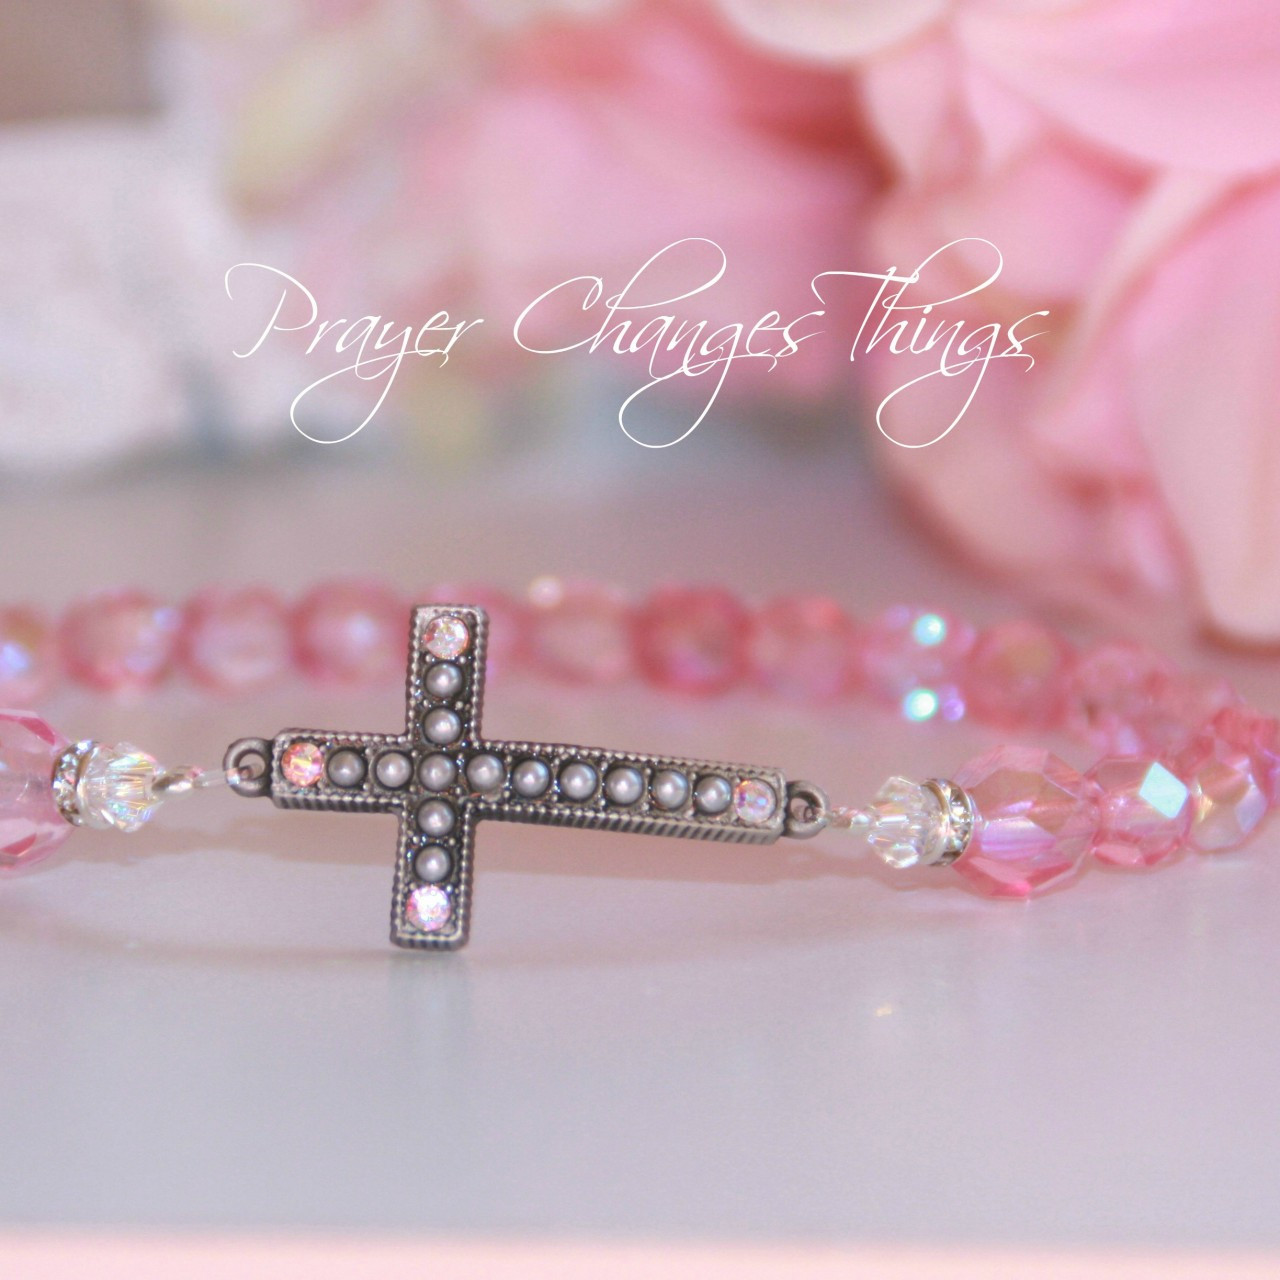 IN-103 Rose Crystal Jeweled Cross Bracelet